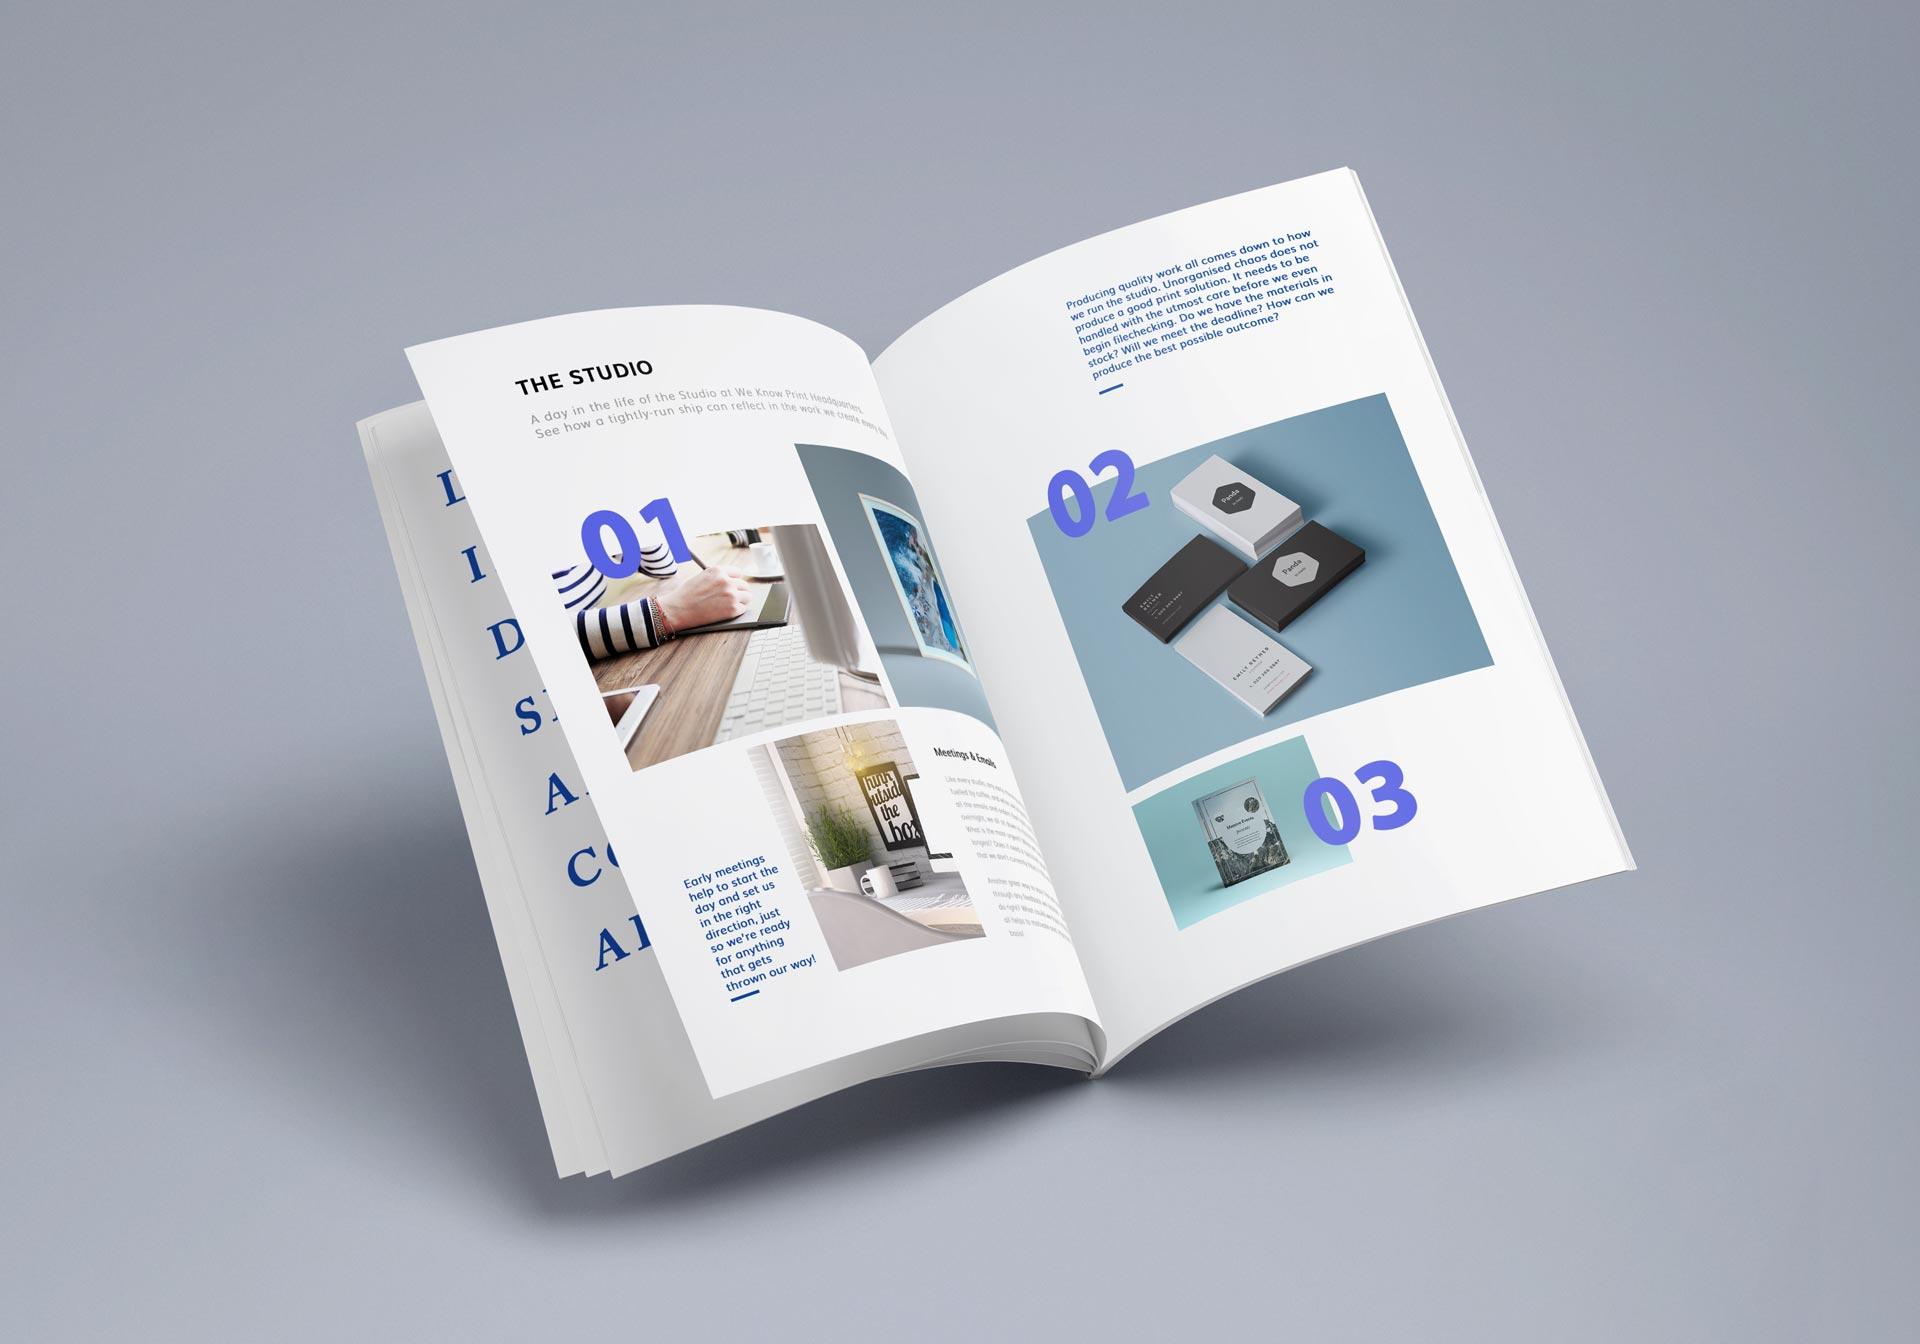 Booklet printing by WeKnowPrint